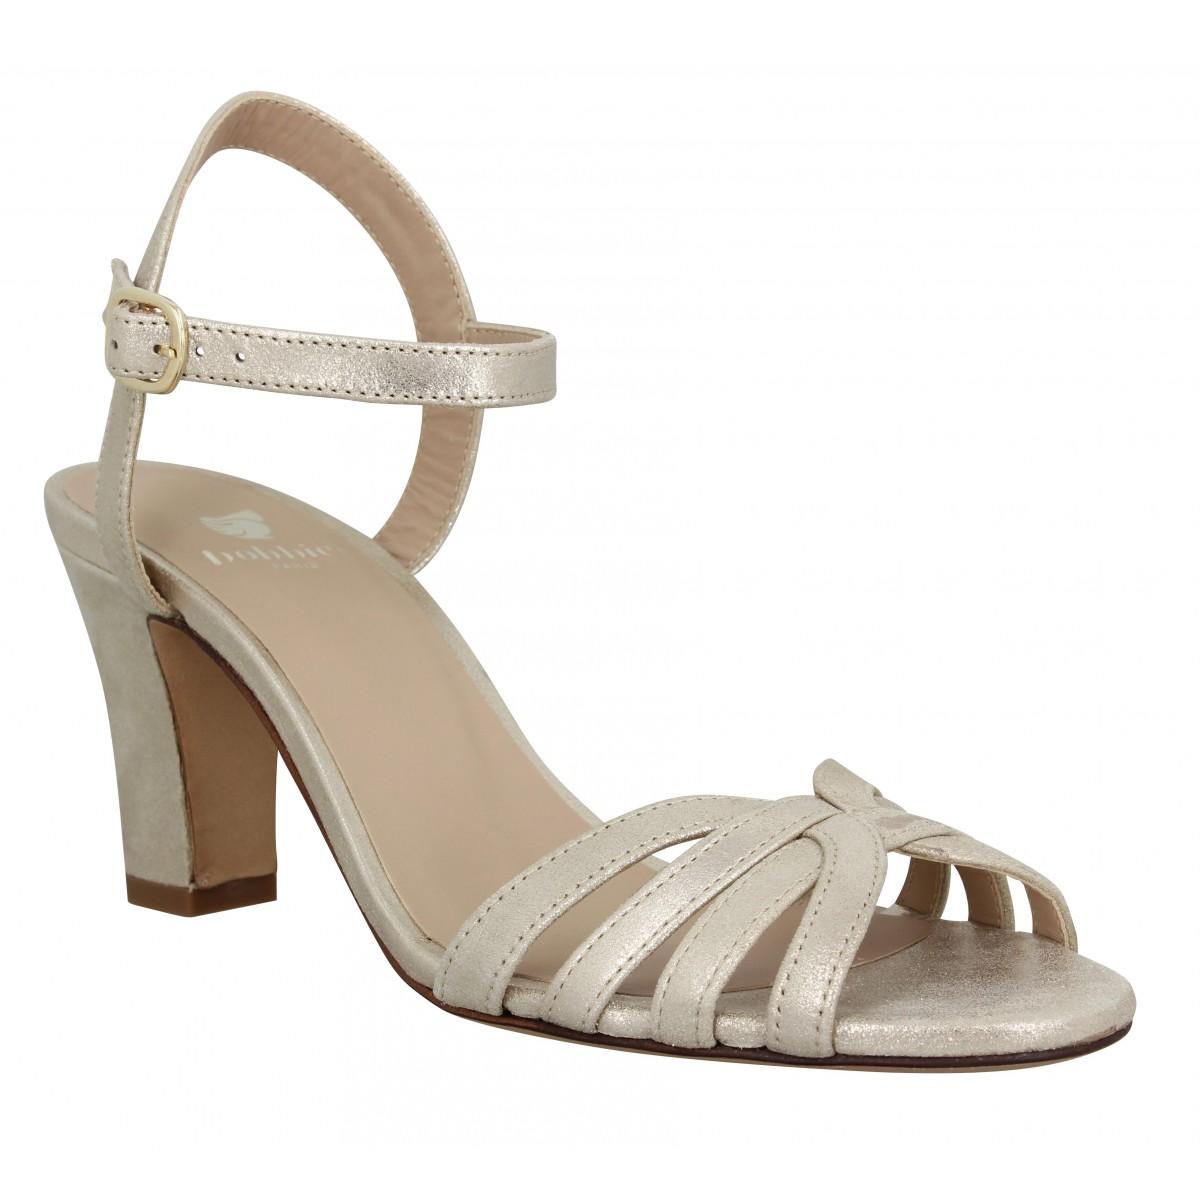 Sandales talons BOBBIES La Ravie cuir Femme Or Sable